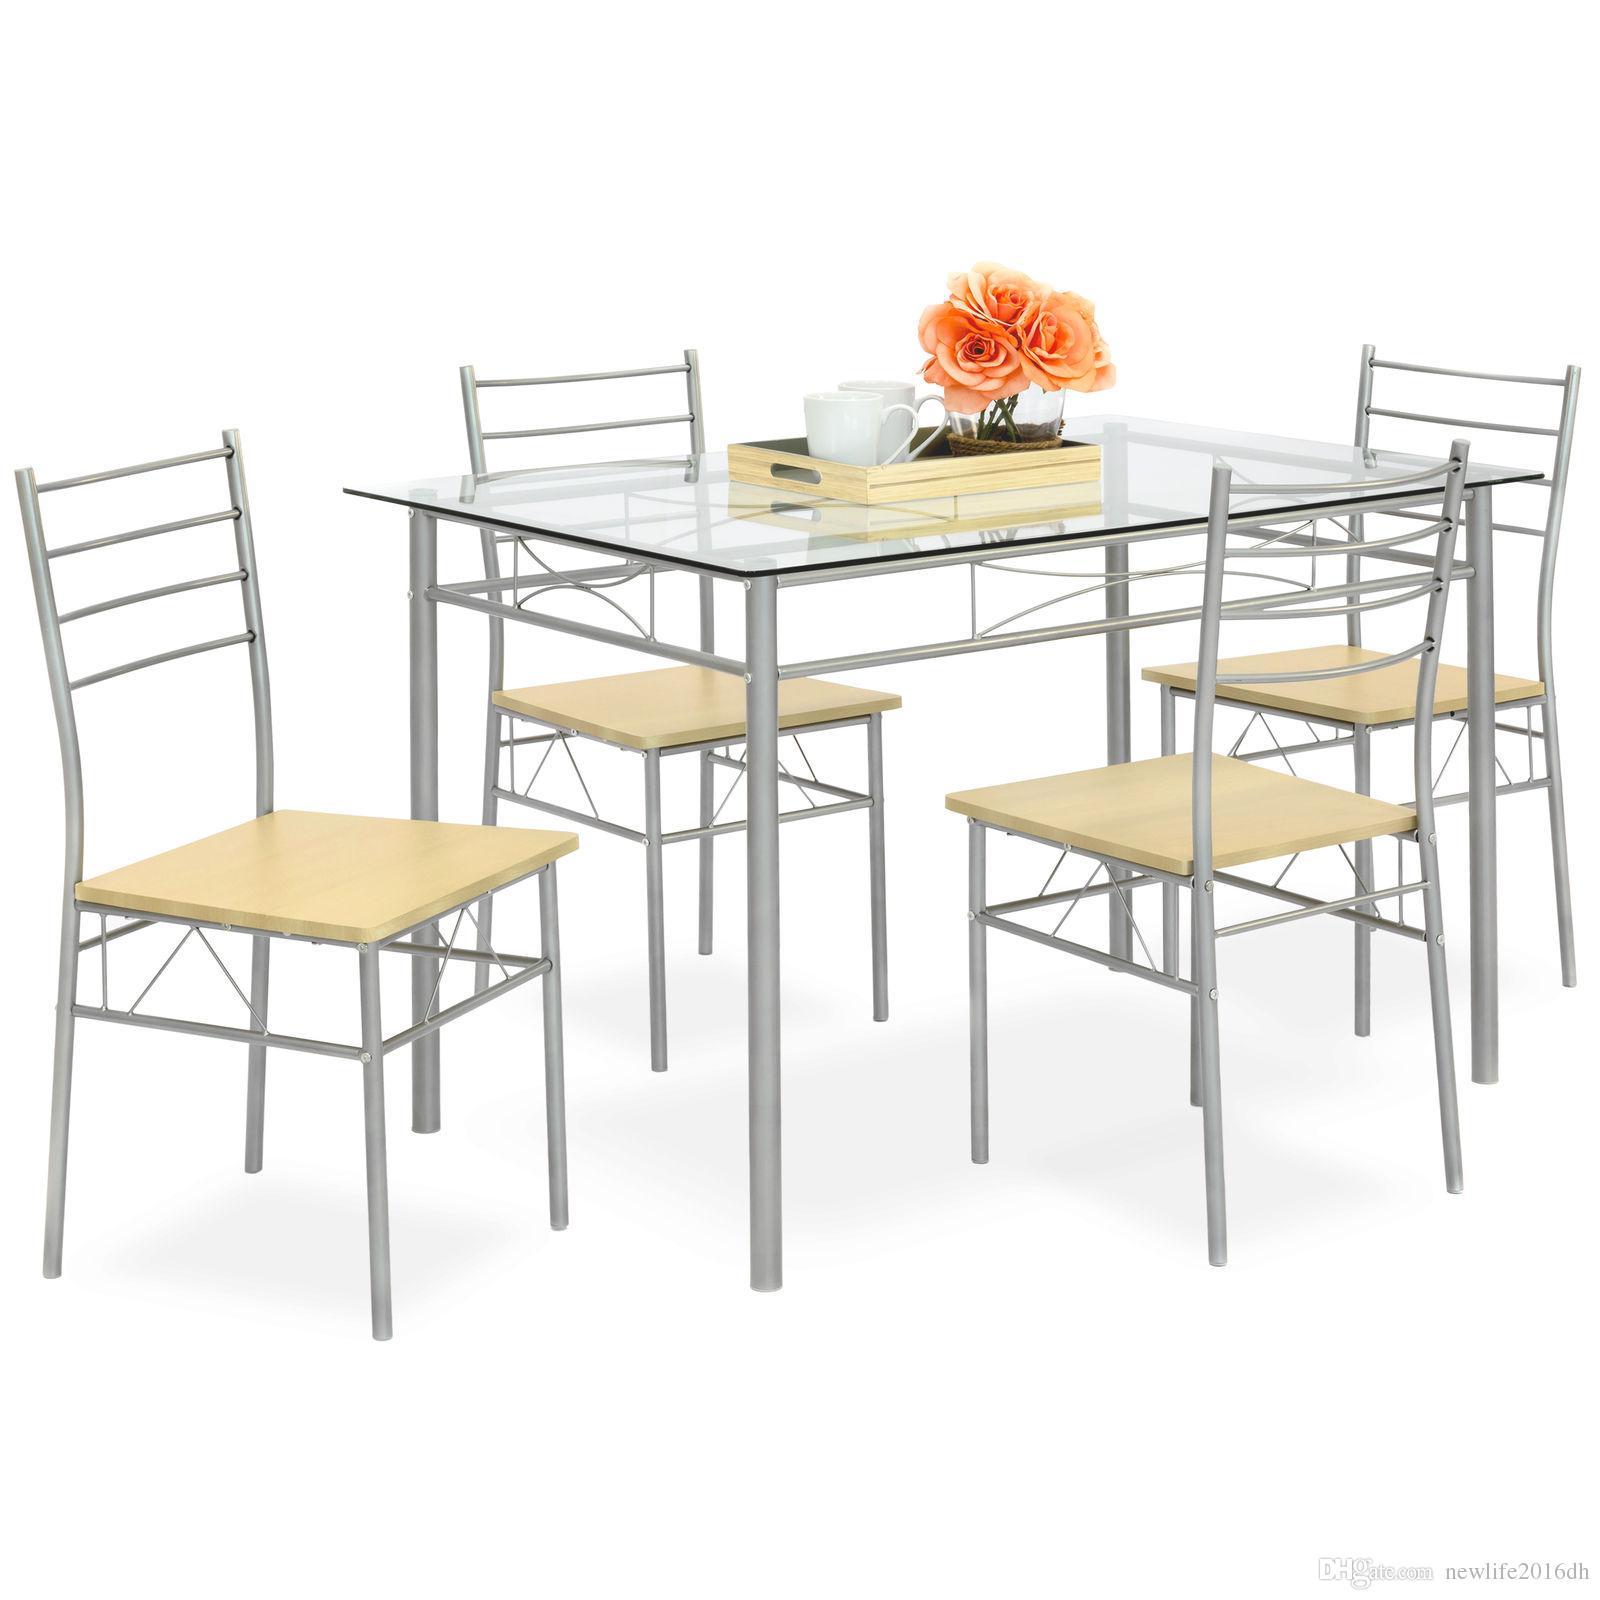 Juego de mesa de comedor BCP Home de 5 piezas con tapa de vidrio, 4 sillas  (plata)